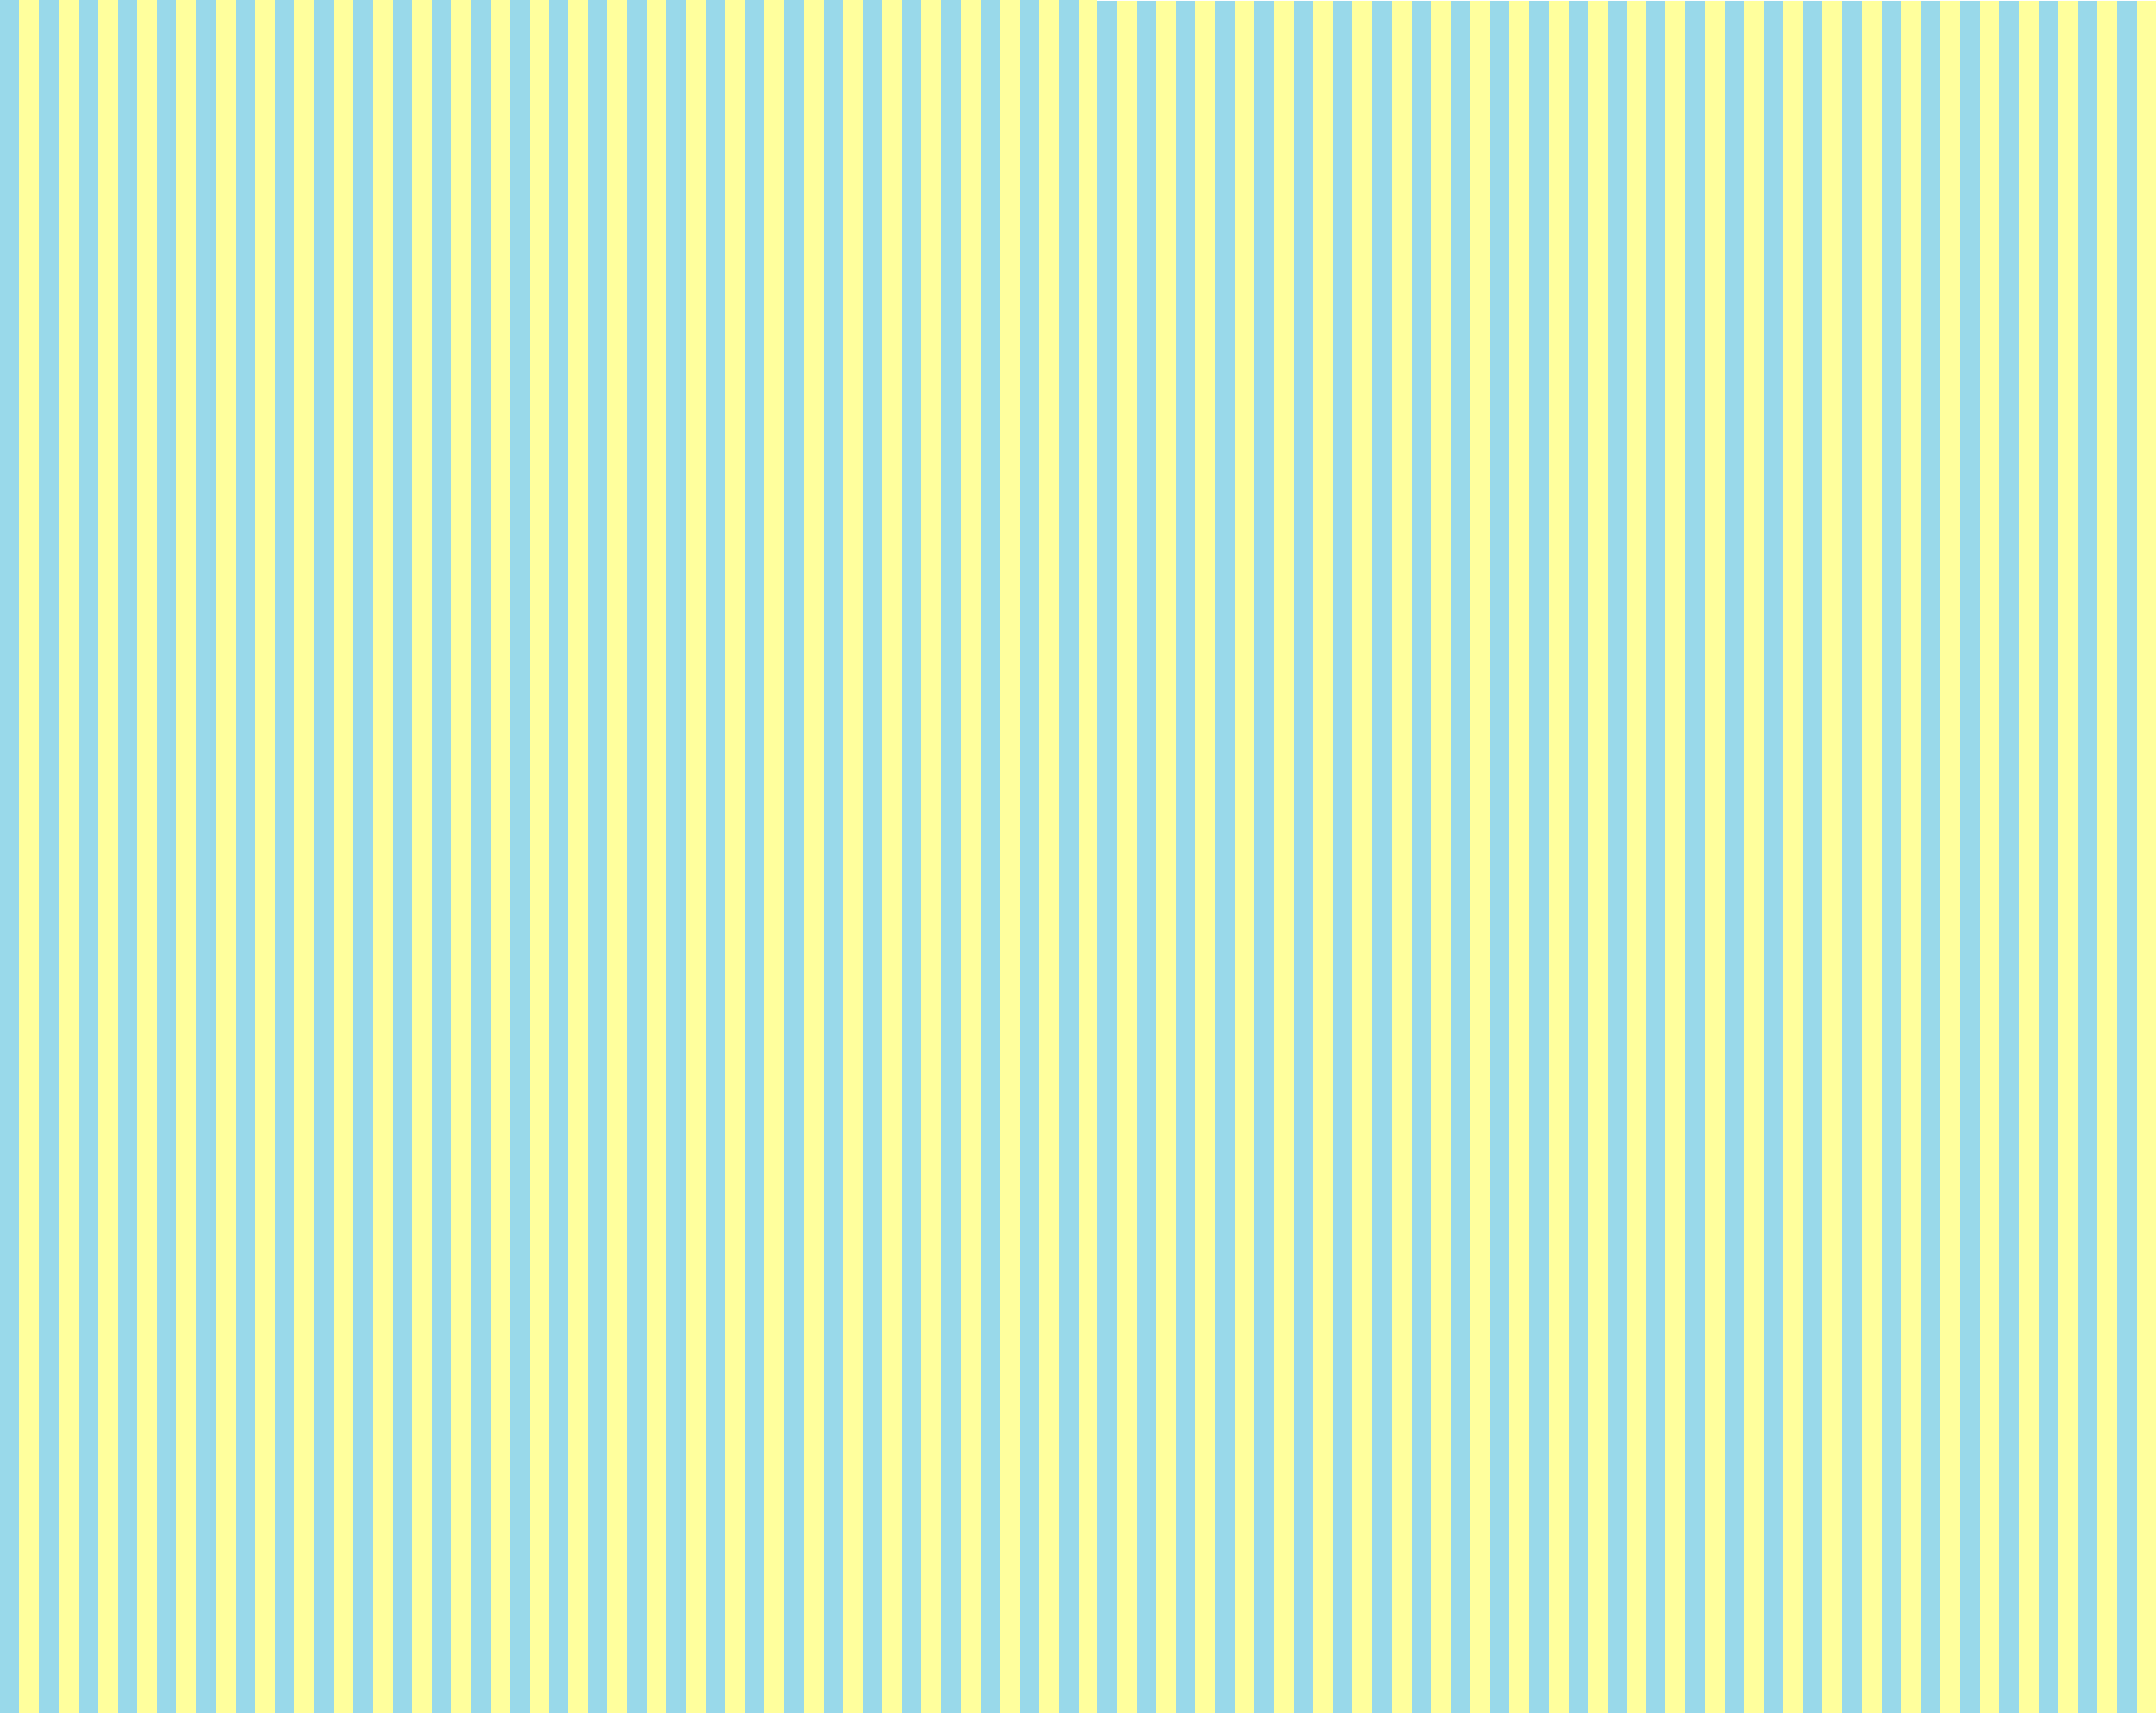 Vanilla Stripe Background by OmbraSova on DeviantArt